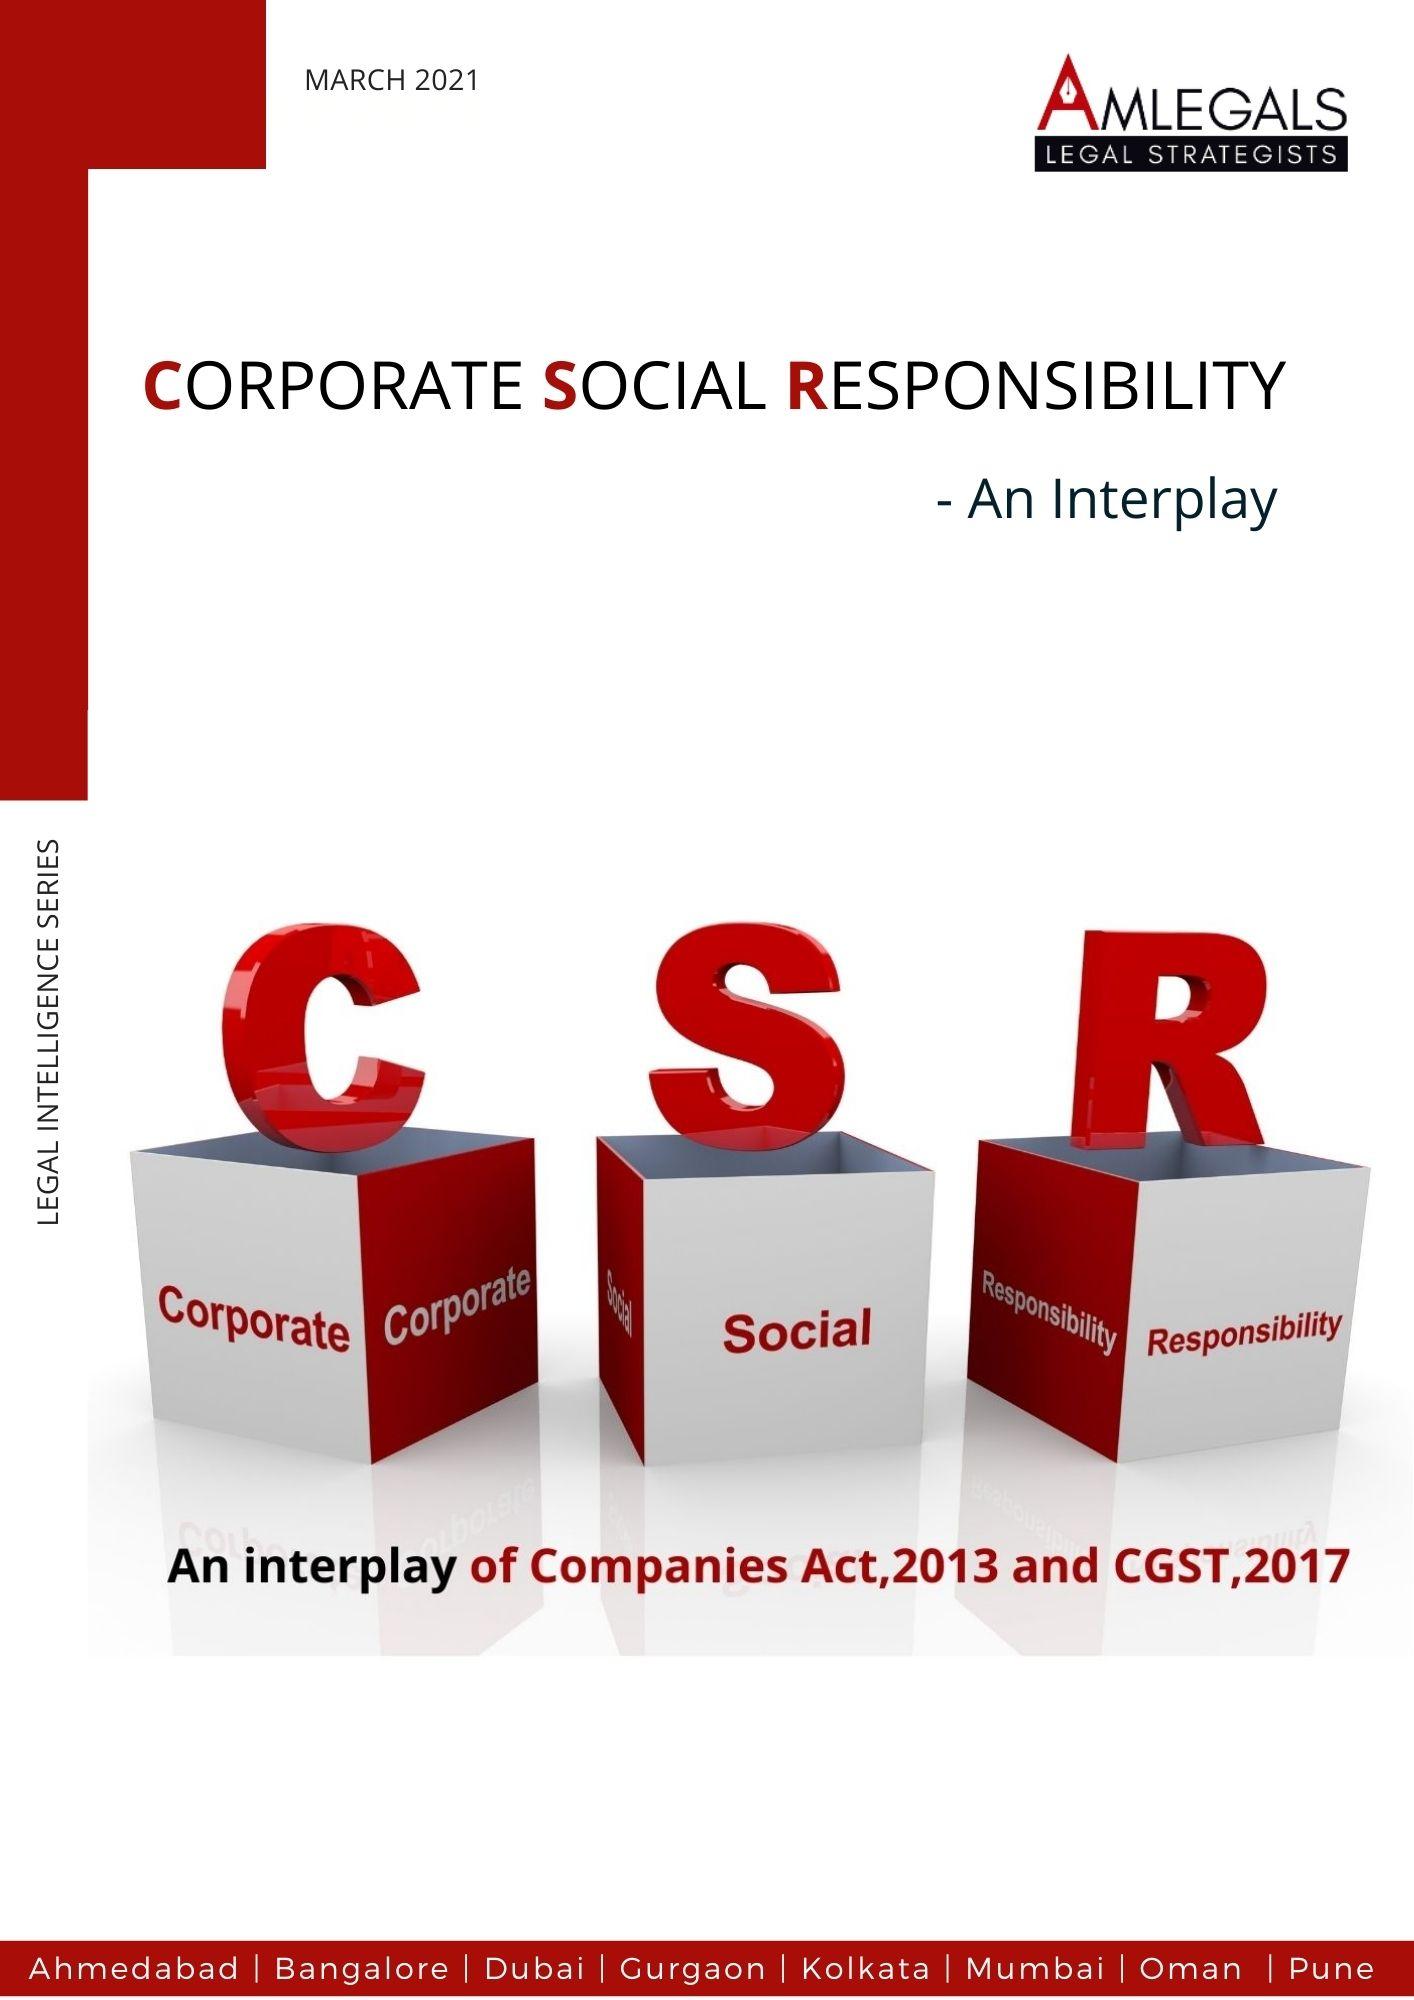 CSR-AN INTERPLAY BETWEEN COMPANIES ACT AND CGST